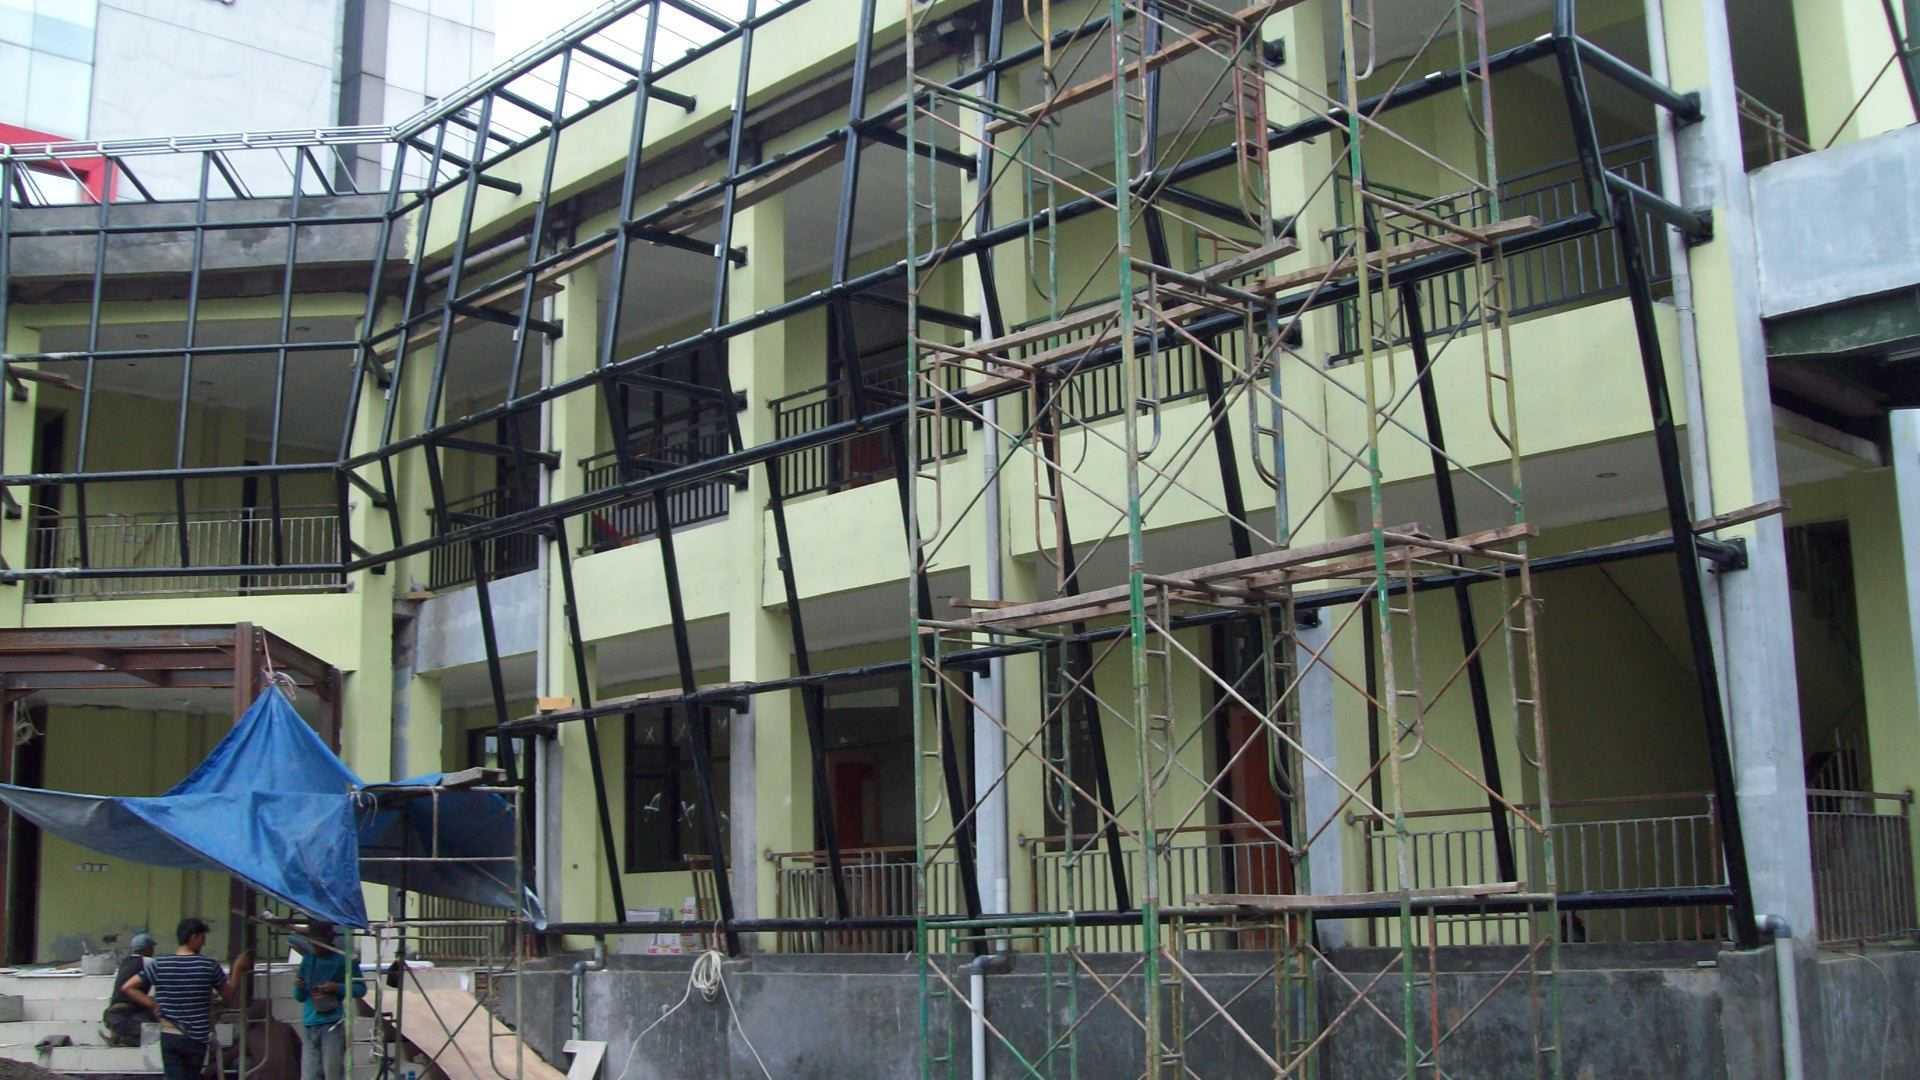 Archdesignbuild7 Kumkm Building Soekarno Hatta, Bandung, West Java Soekarno Hatta, Bandung, West Java Photo-21037 Modern  21037